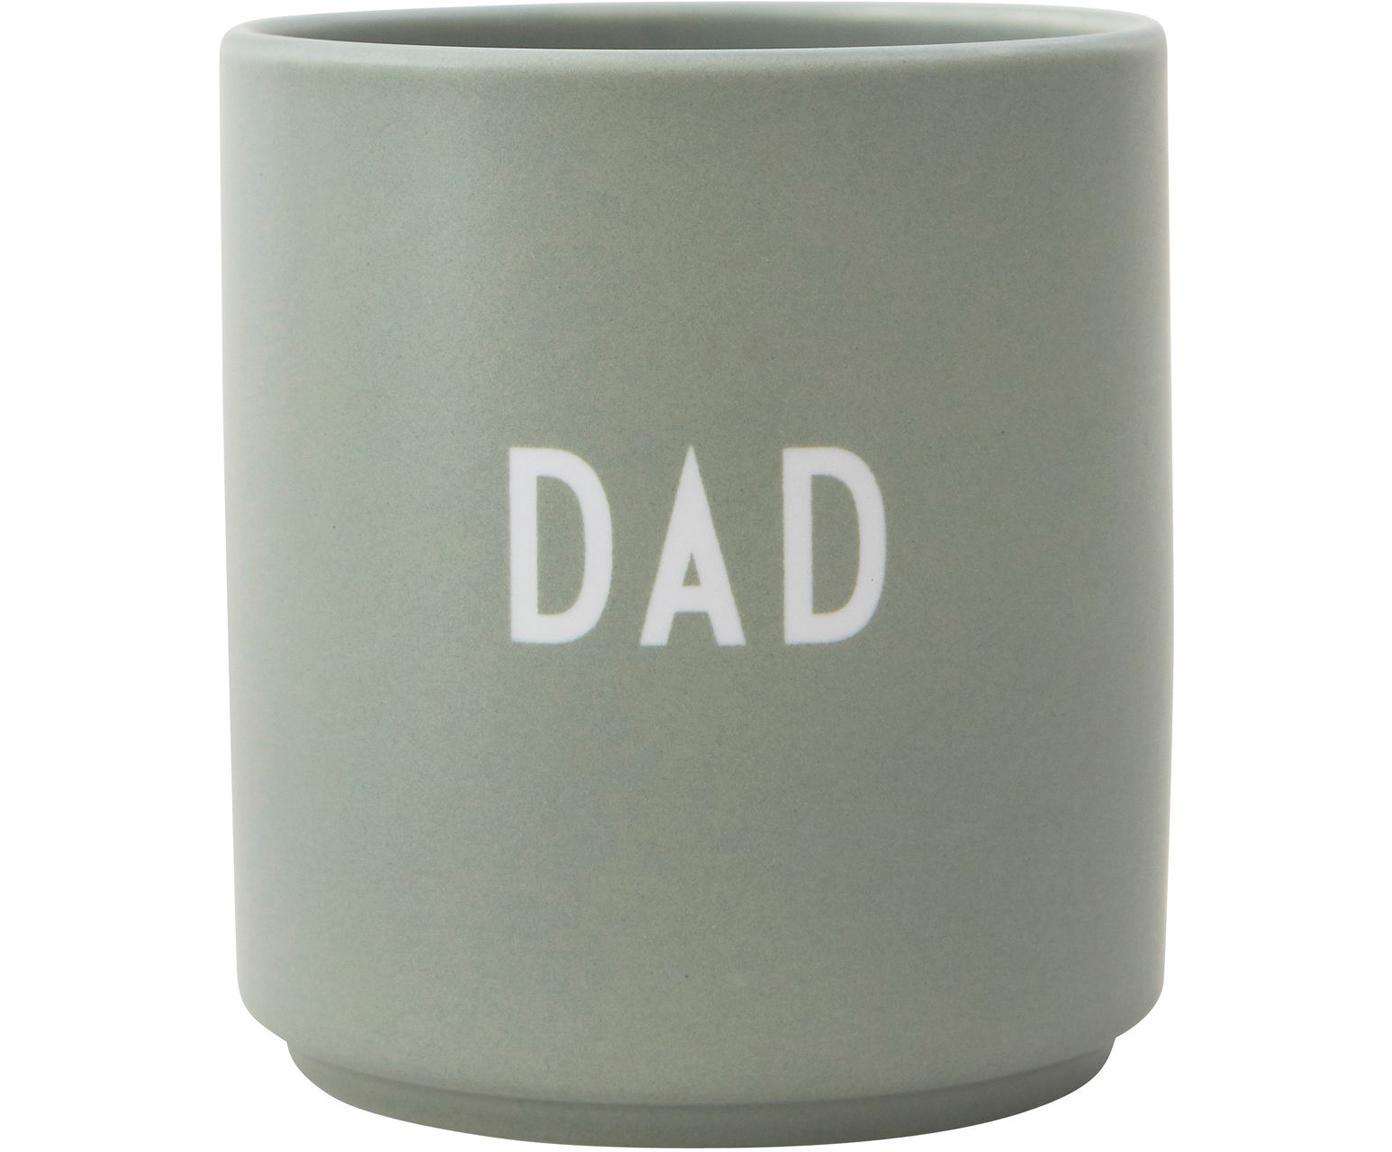 Taza Favourite, Porcelana fina, esmaltado, Verde, blanco, Ø 8 x Al 9 cm